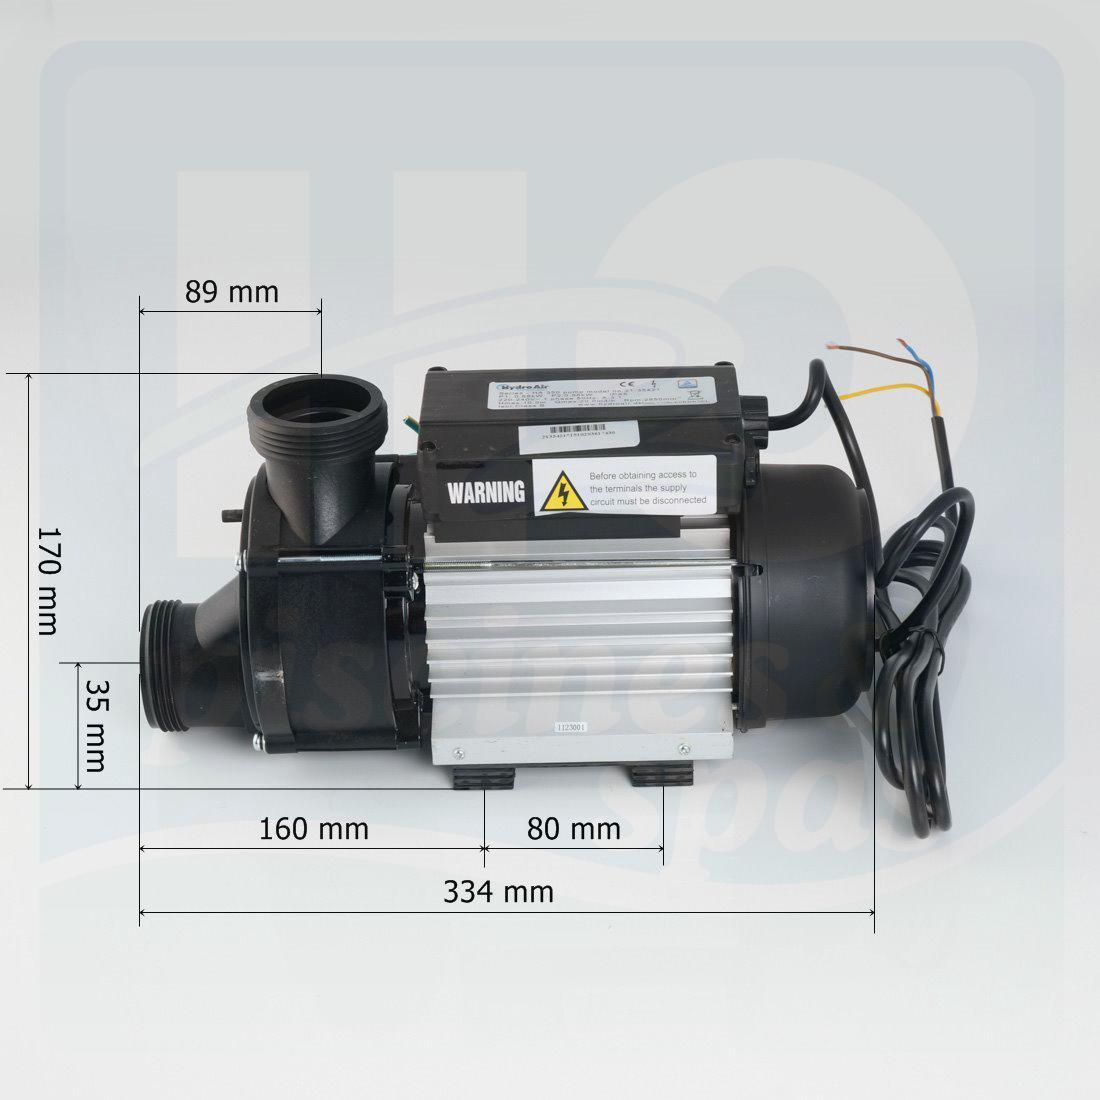 pompe de circulation vitesse fixe hydroair ha350 aspiration type vidange h2o piscines spas. Black Bedroom Furniture Sets. Home Design Ideas